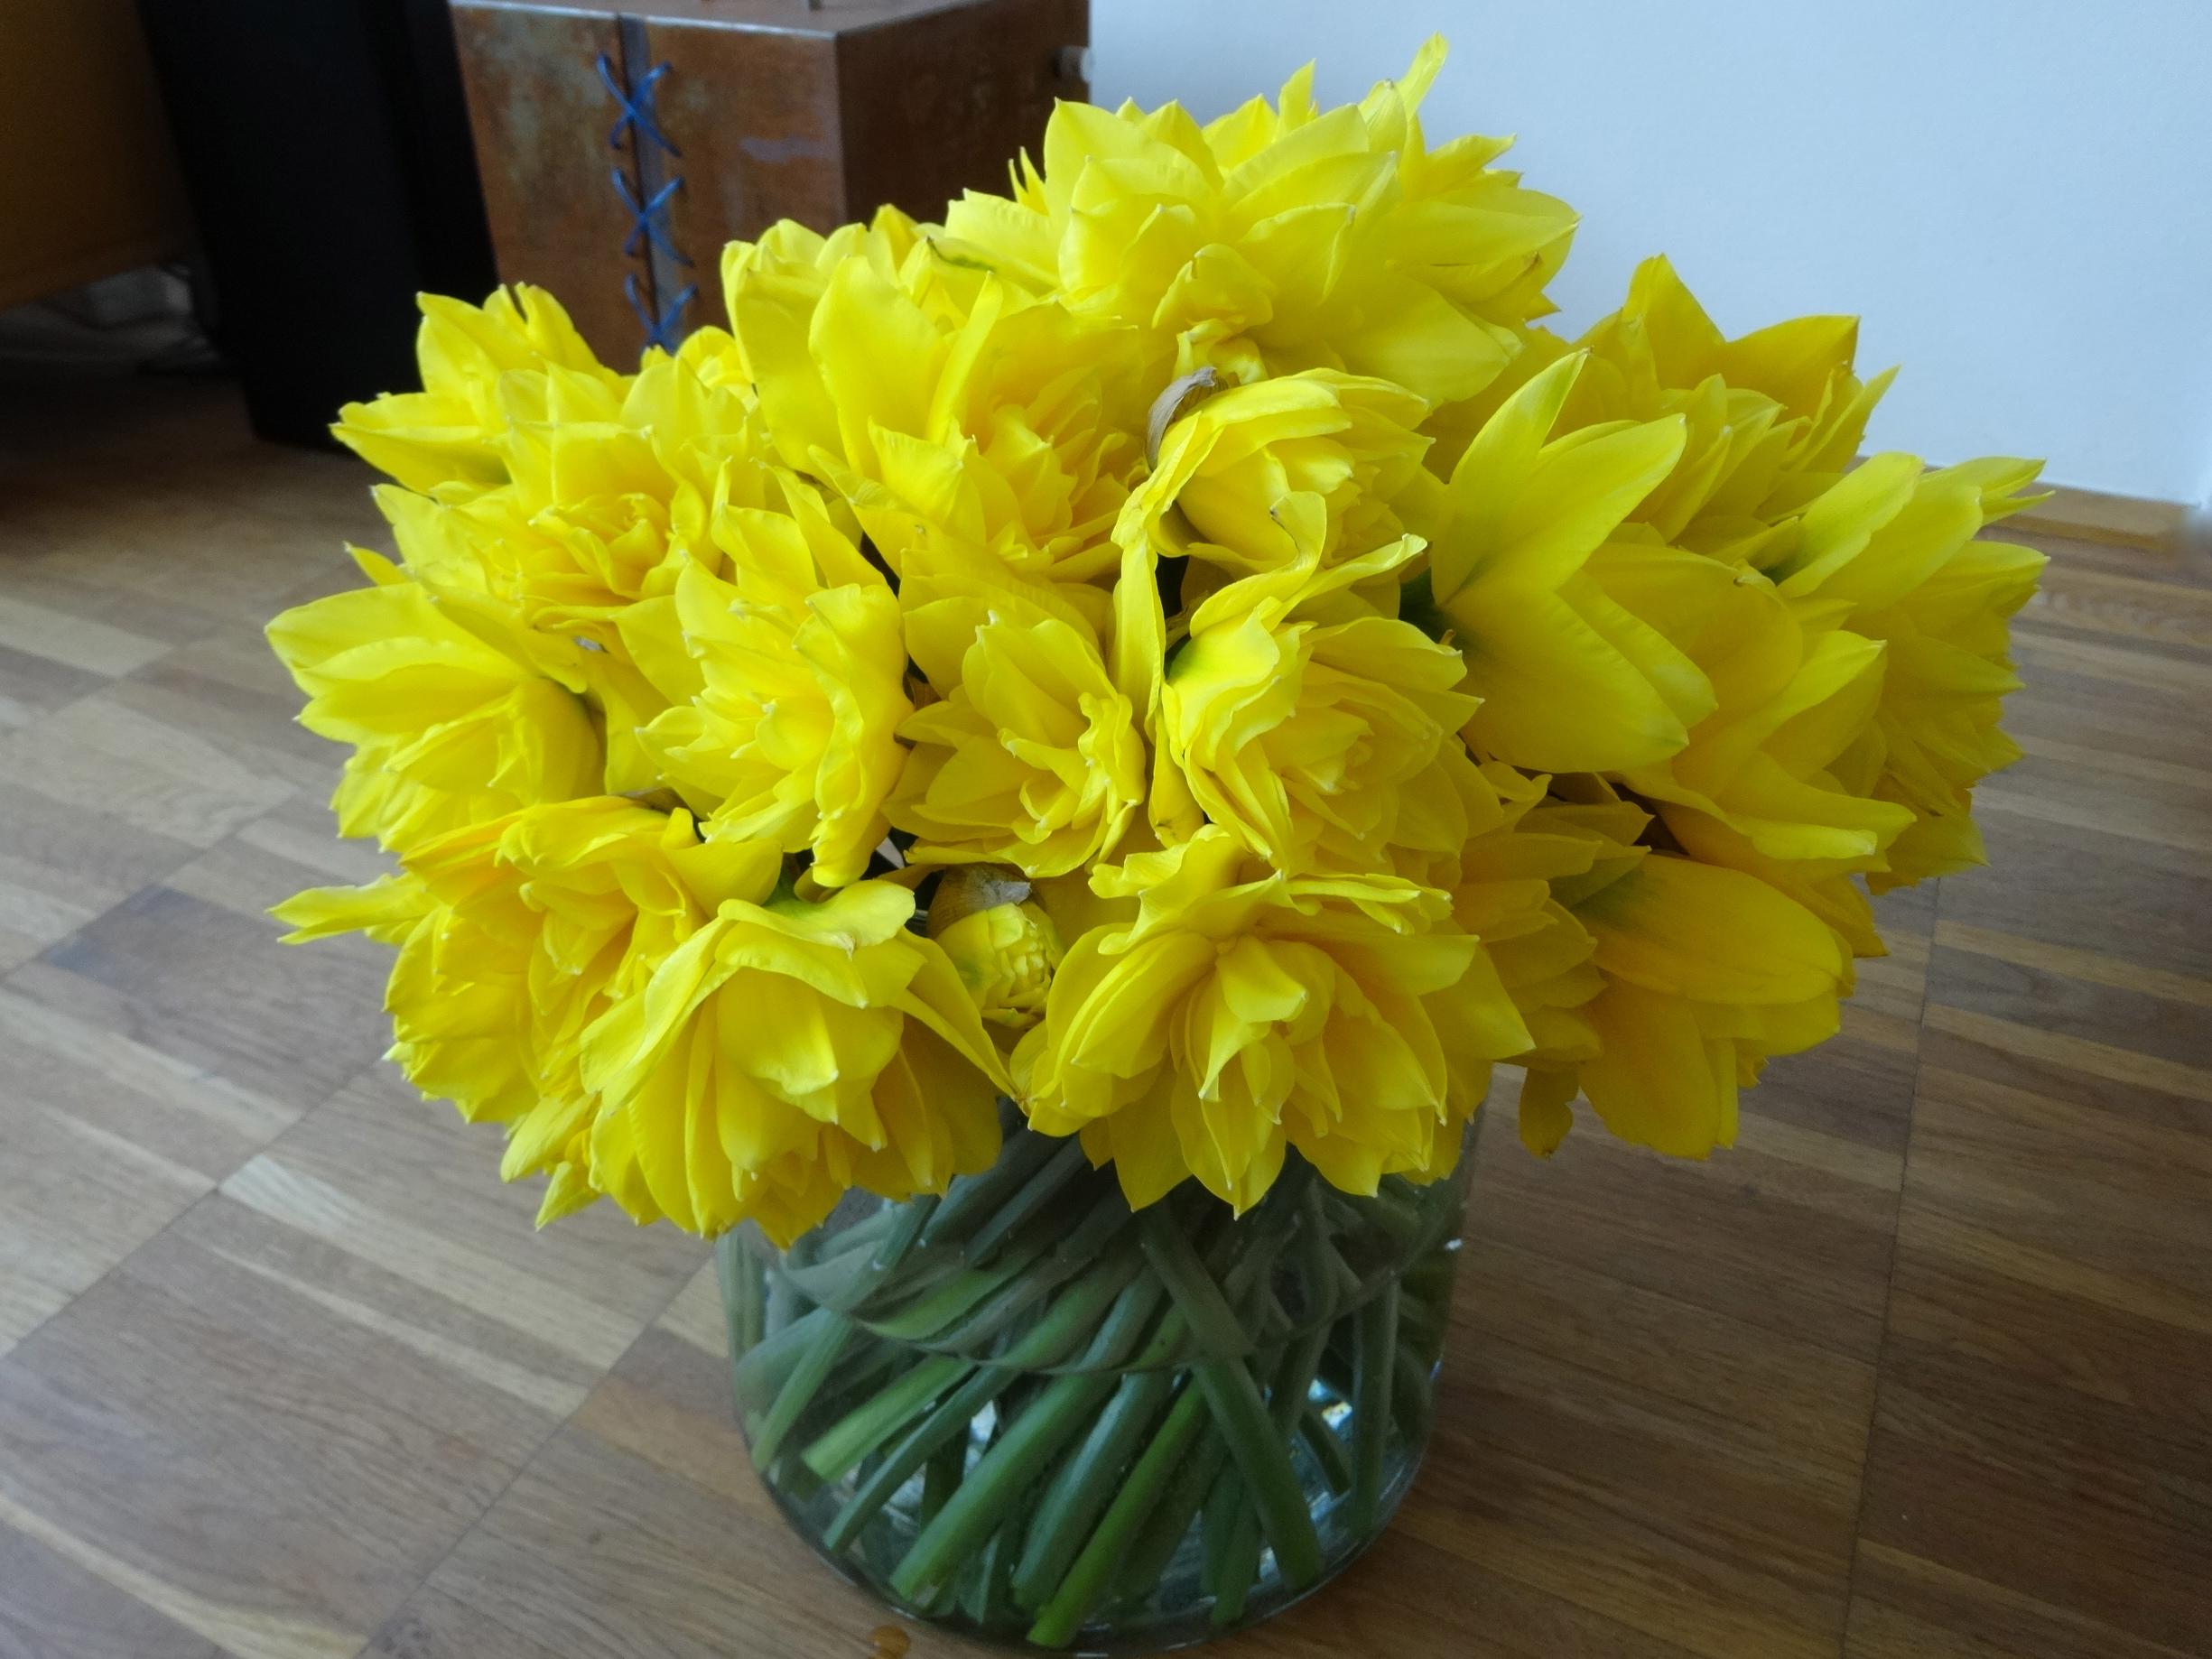 DSC03470 Osterglocken Daffodils Narzissen 4 HappyFace313